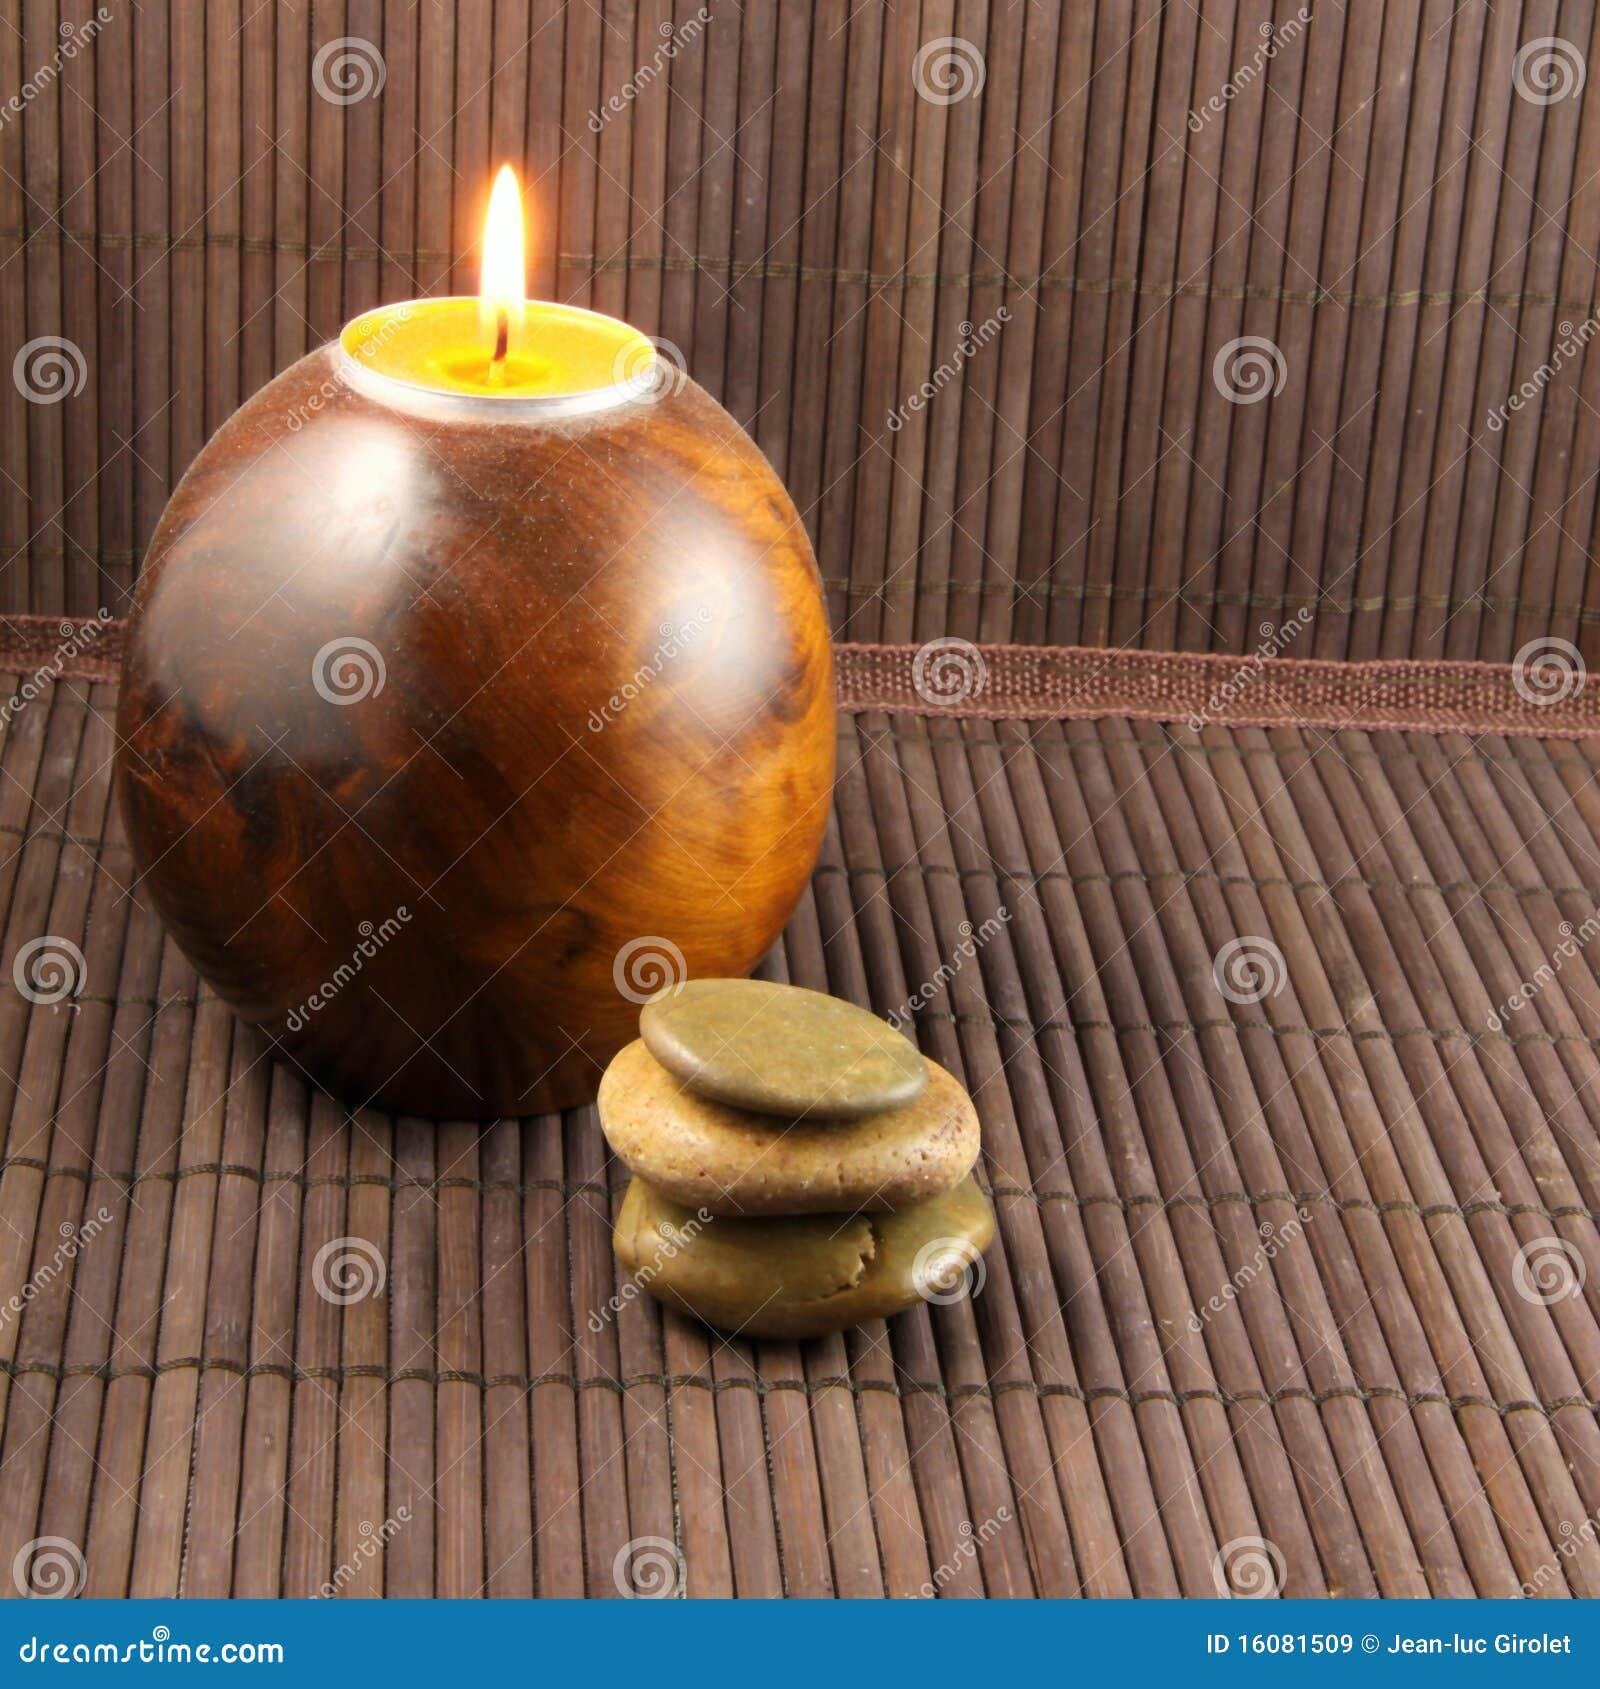 Zen Royalty Free Stock Images Image 16081509